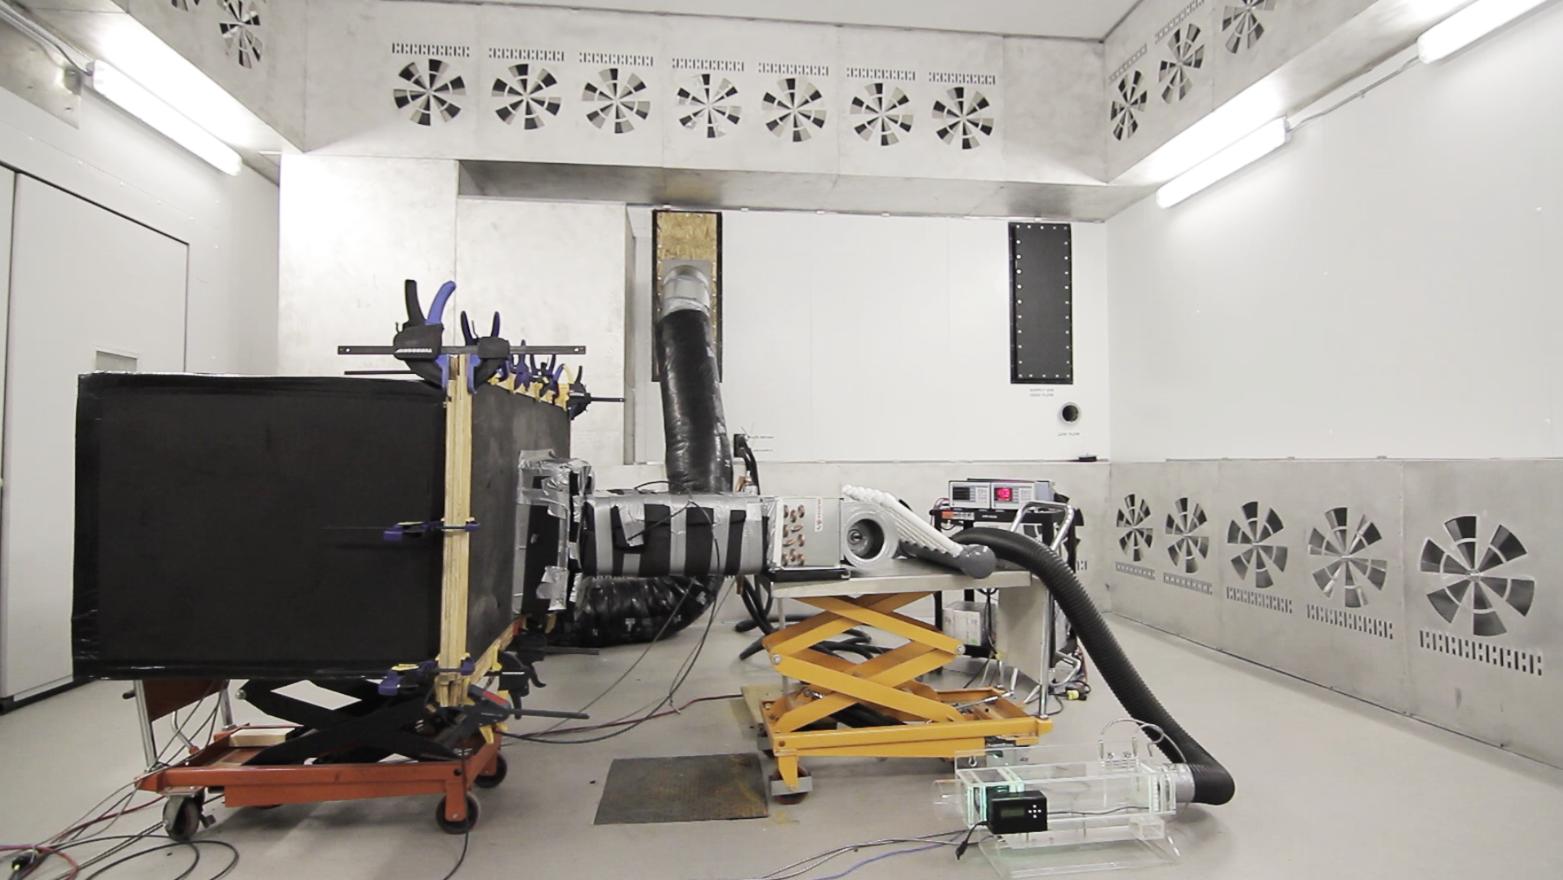 Psychrometric Chamber in PRCN lab